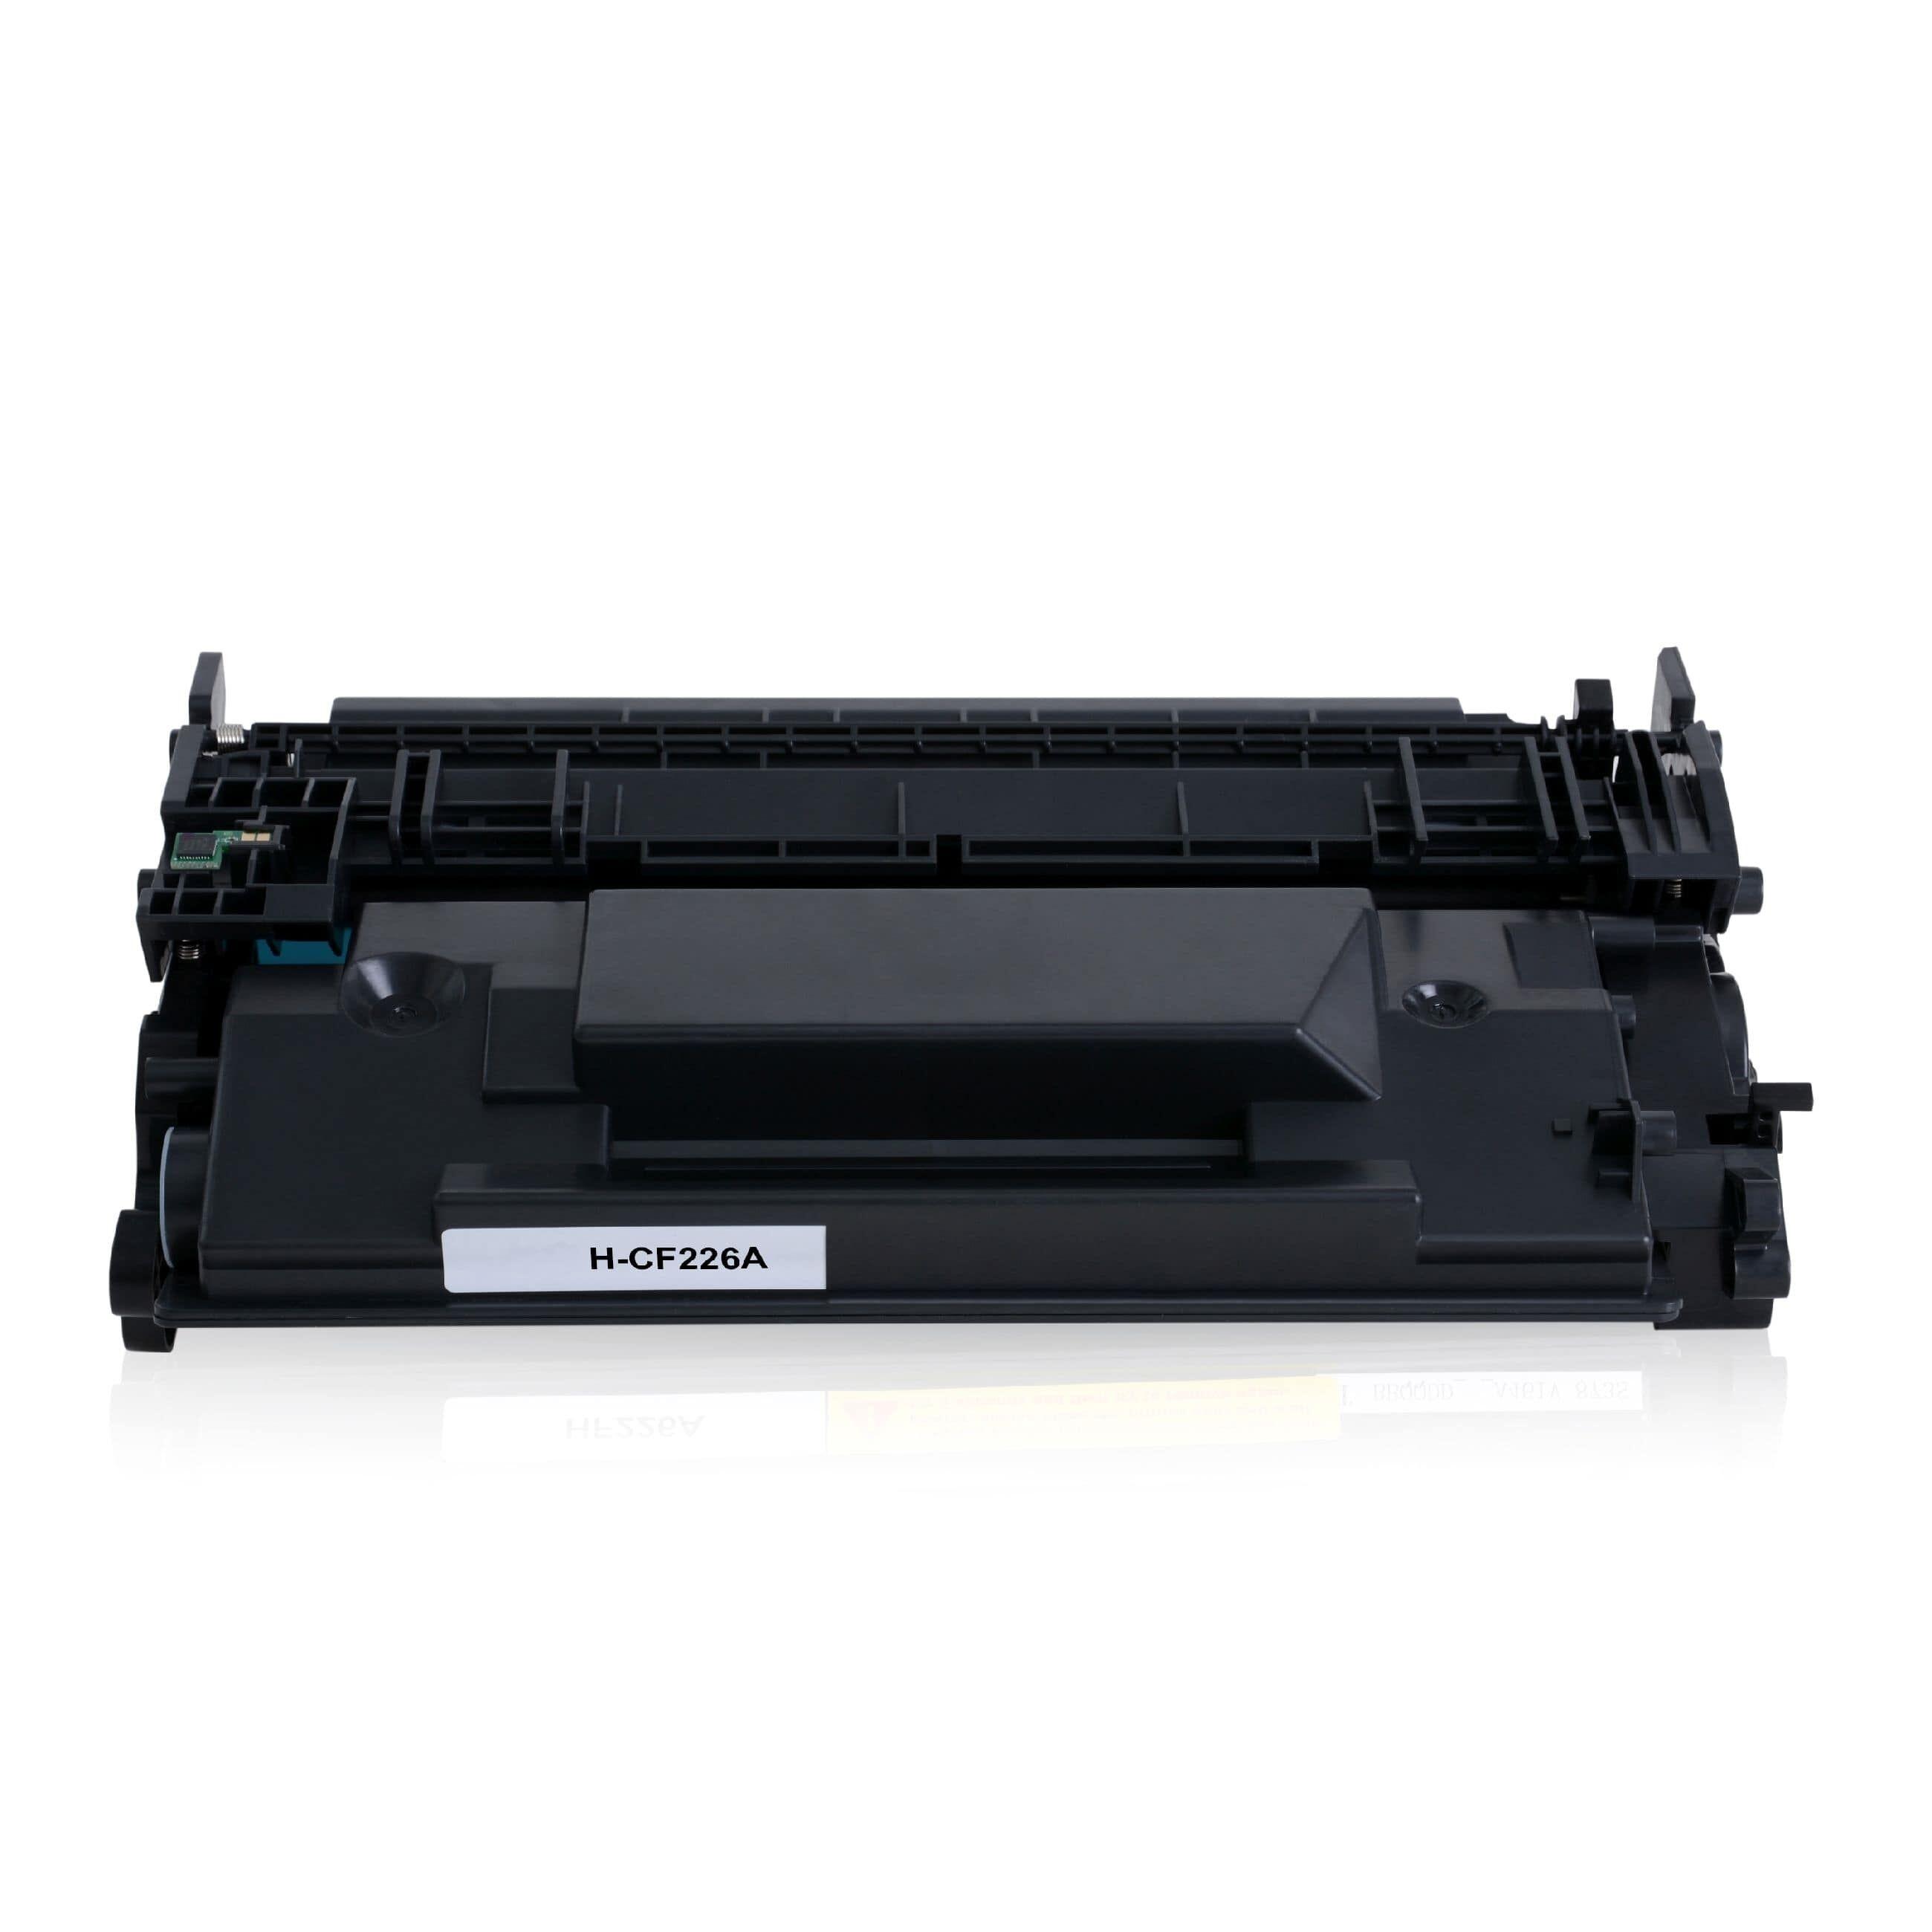 HP Cartouche de Toner pour HP CF226A / 26A noir compatible (de marque ASC)